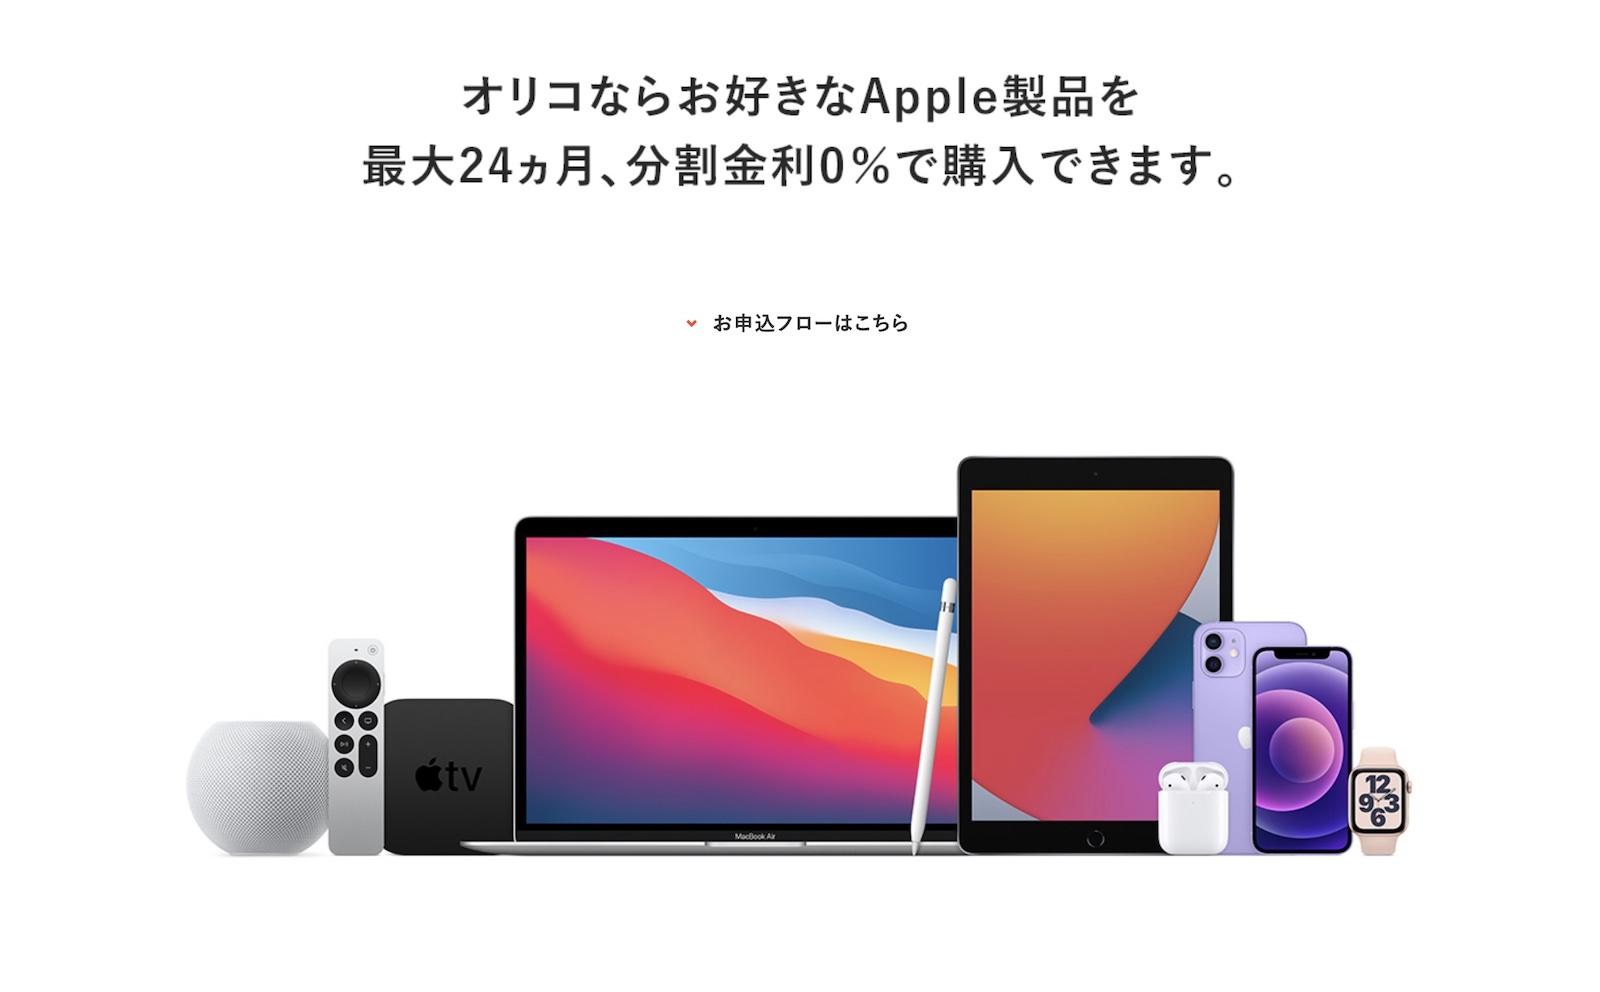 Orico apple shopping loan